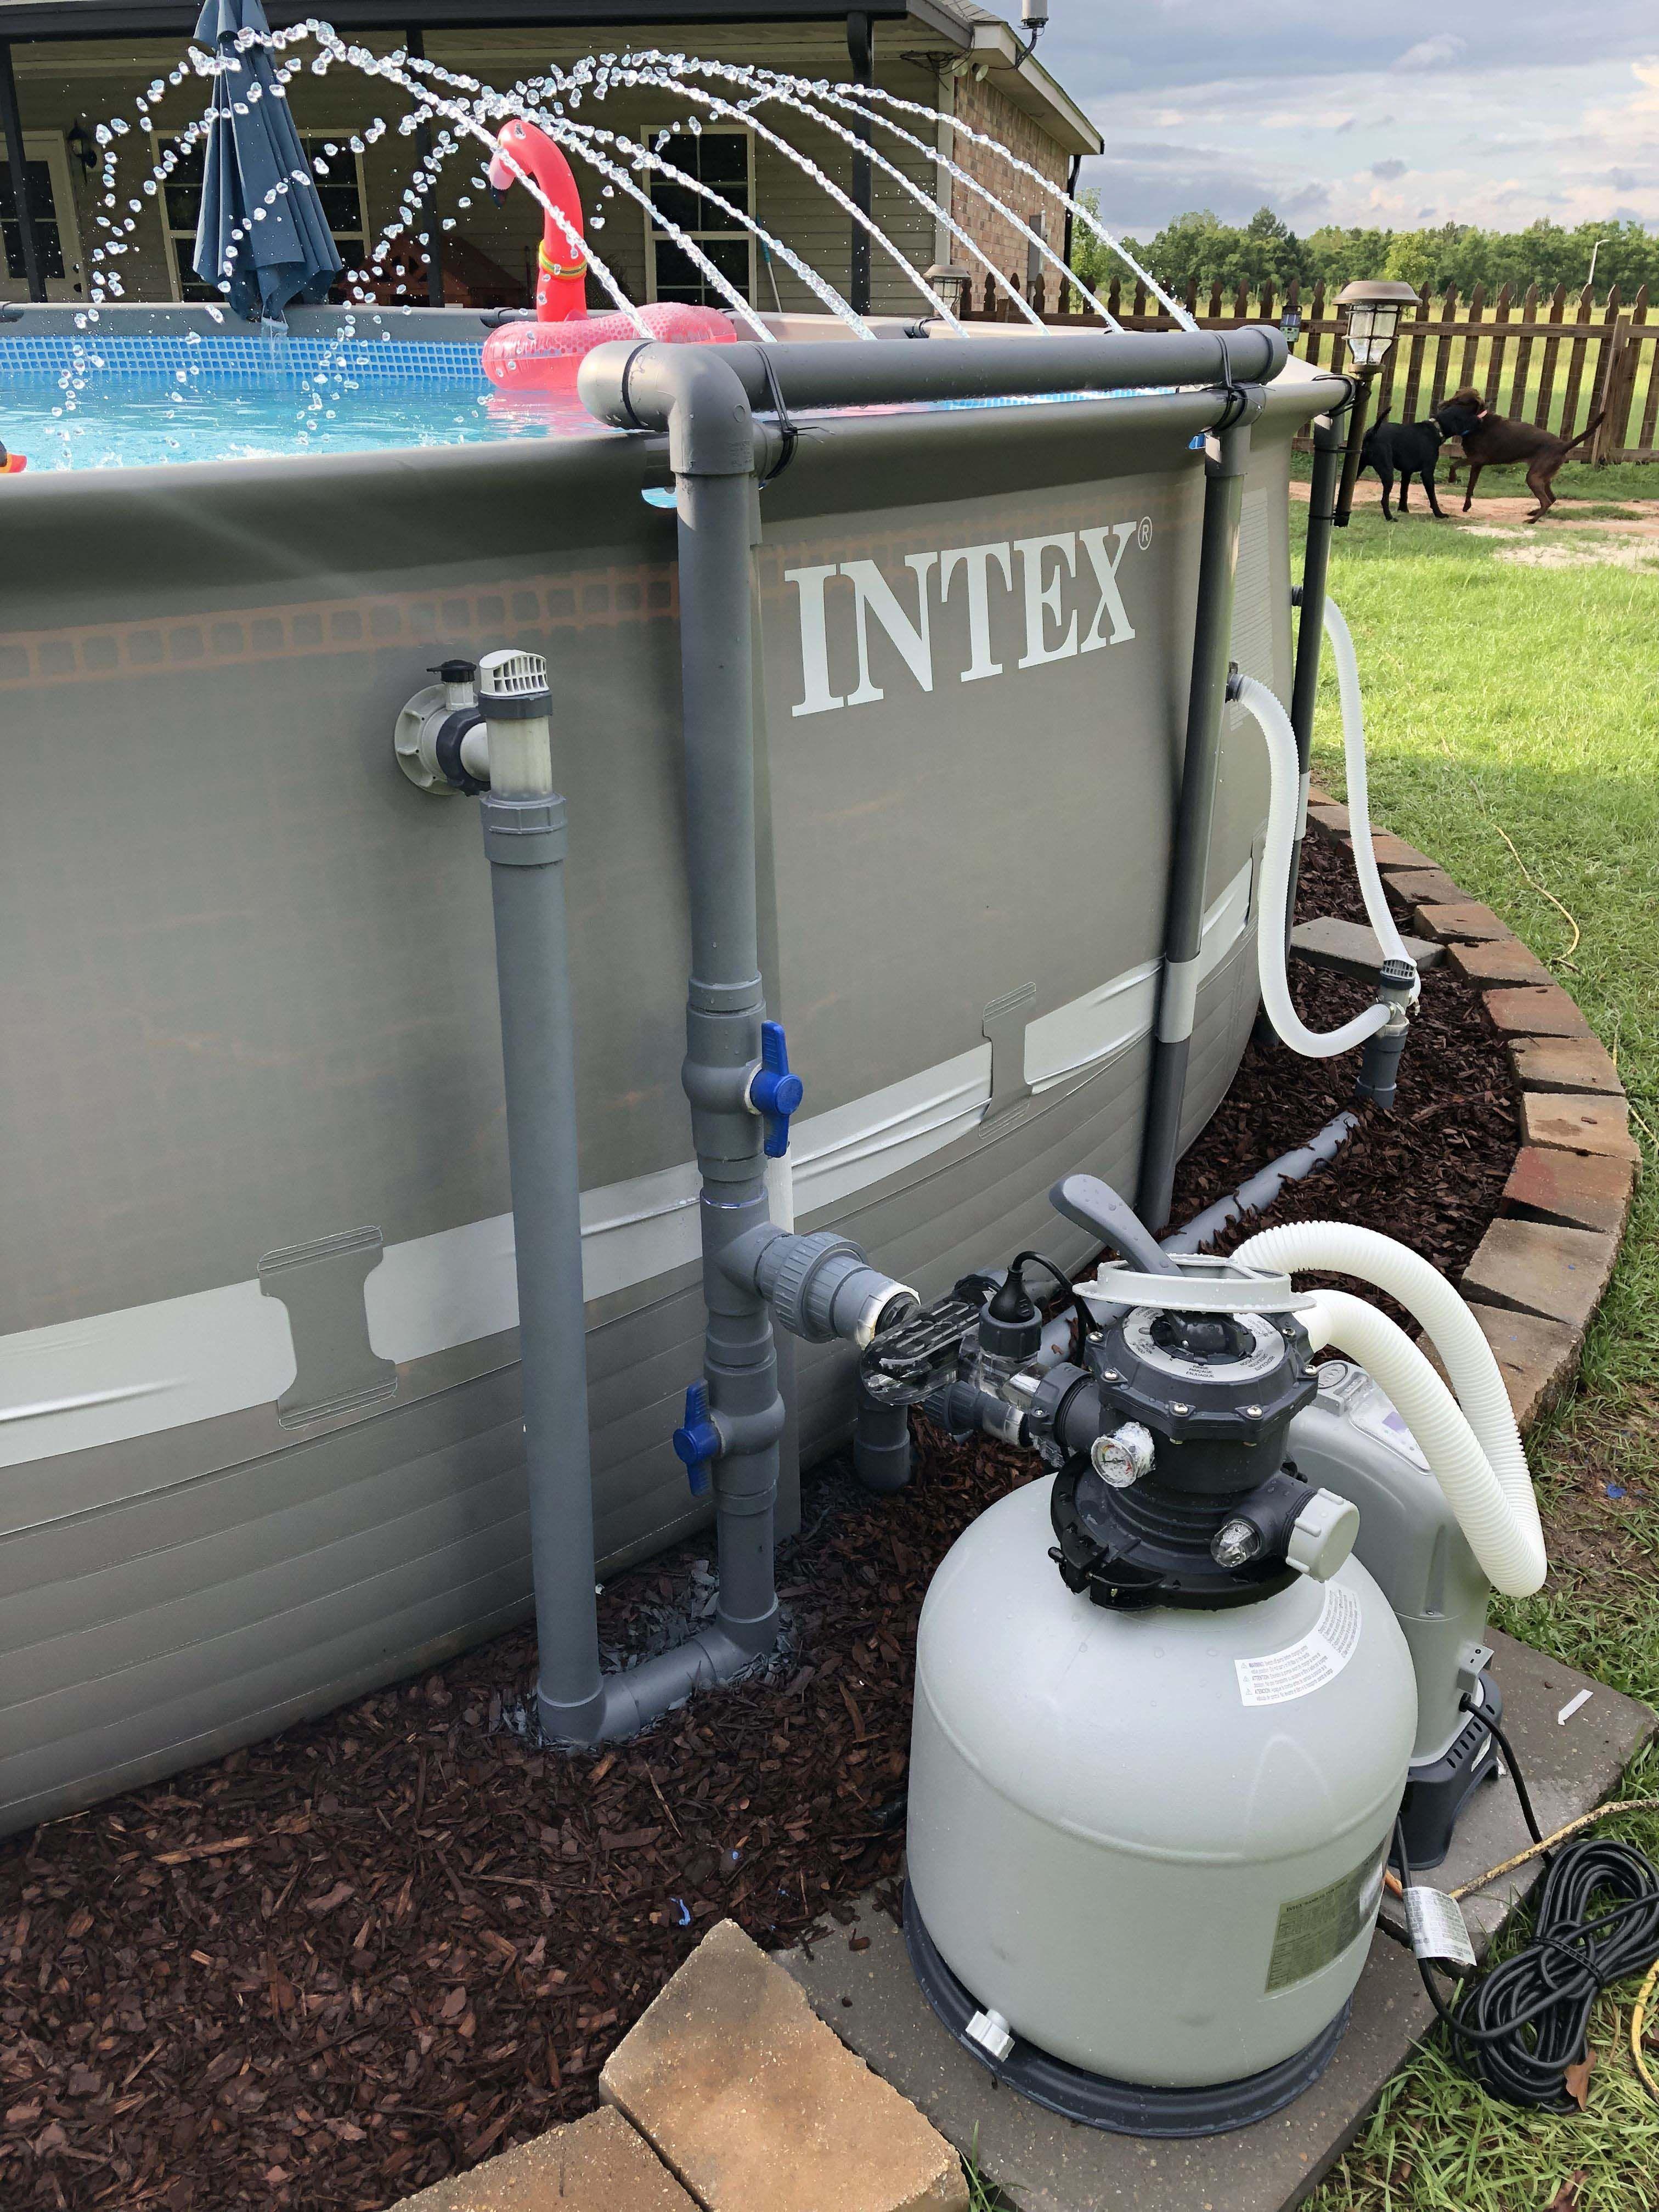 Best Sand Filter For Above Ground Pool Diy Swimming Pool Pool Pump Intex Pool Pump